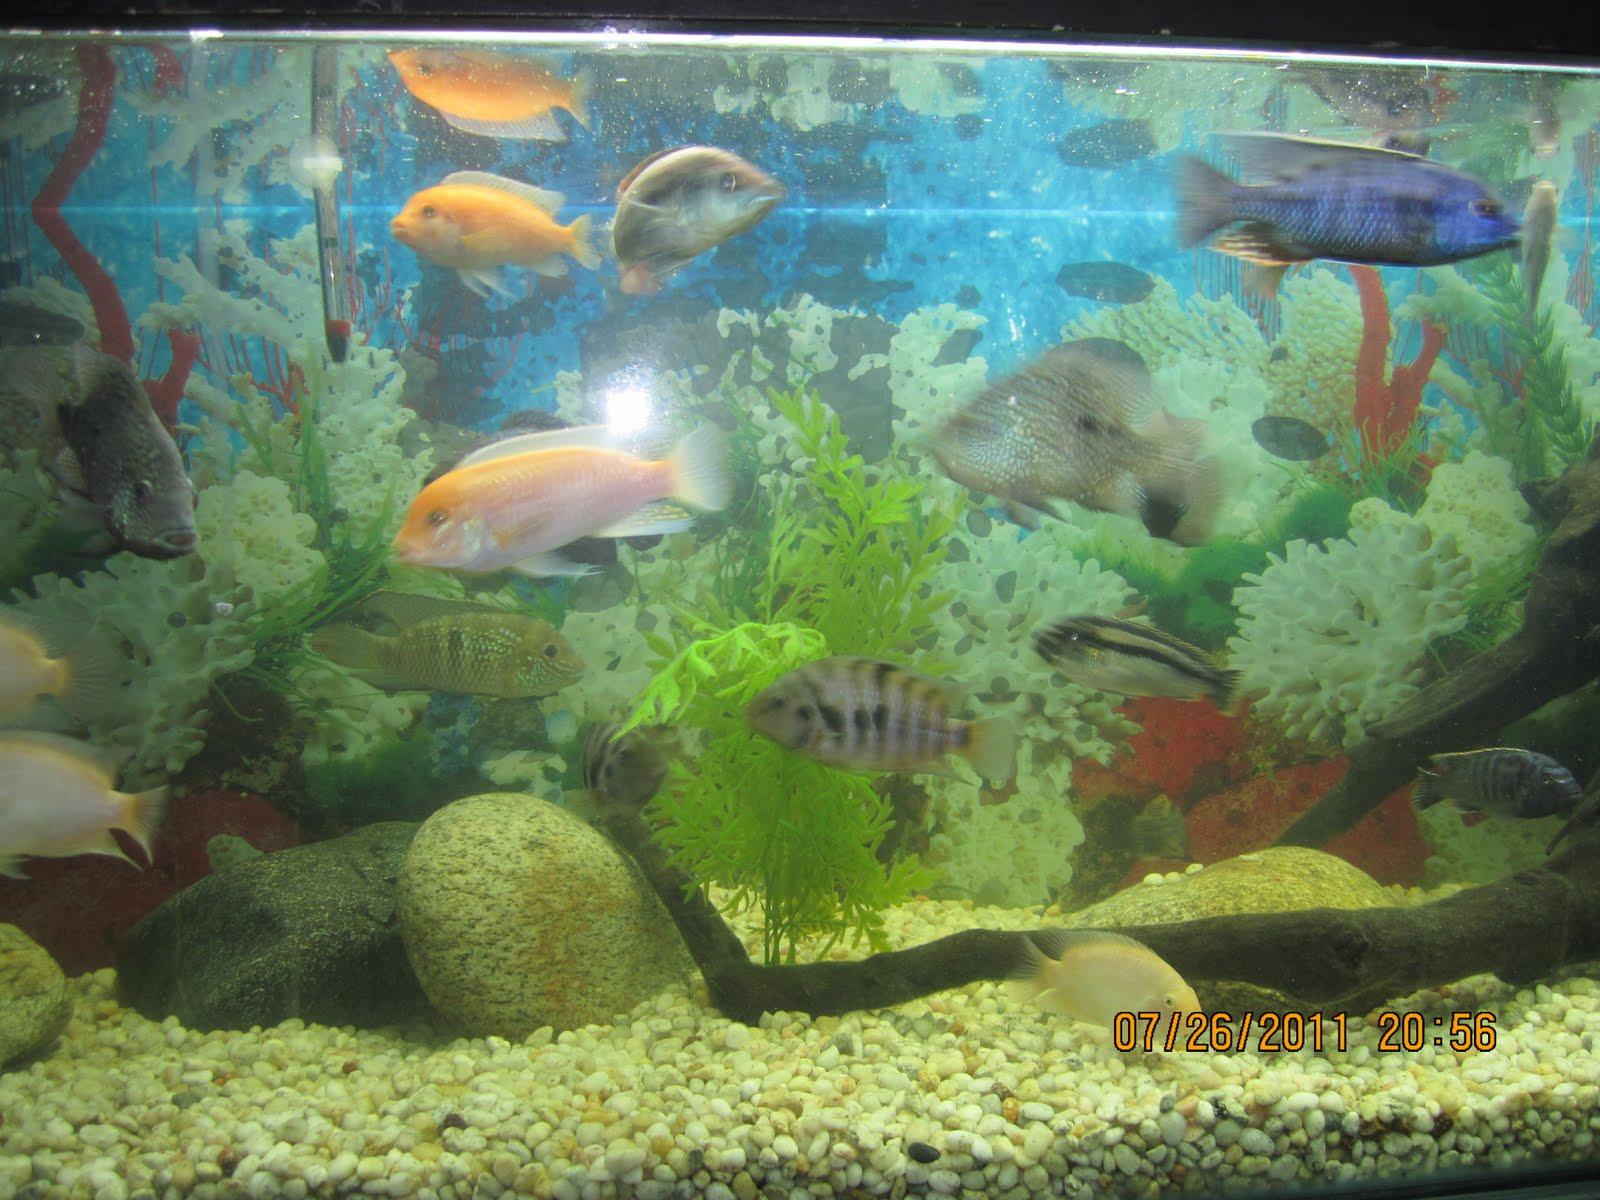 Acuicultura peces ornamentales for Acuariofilia peces ornamentales